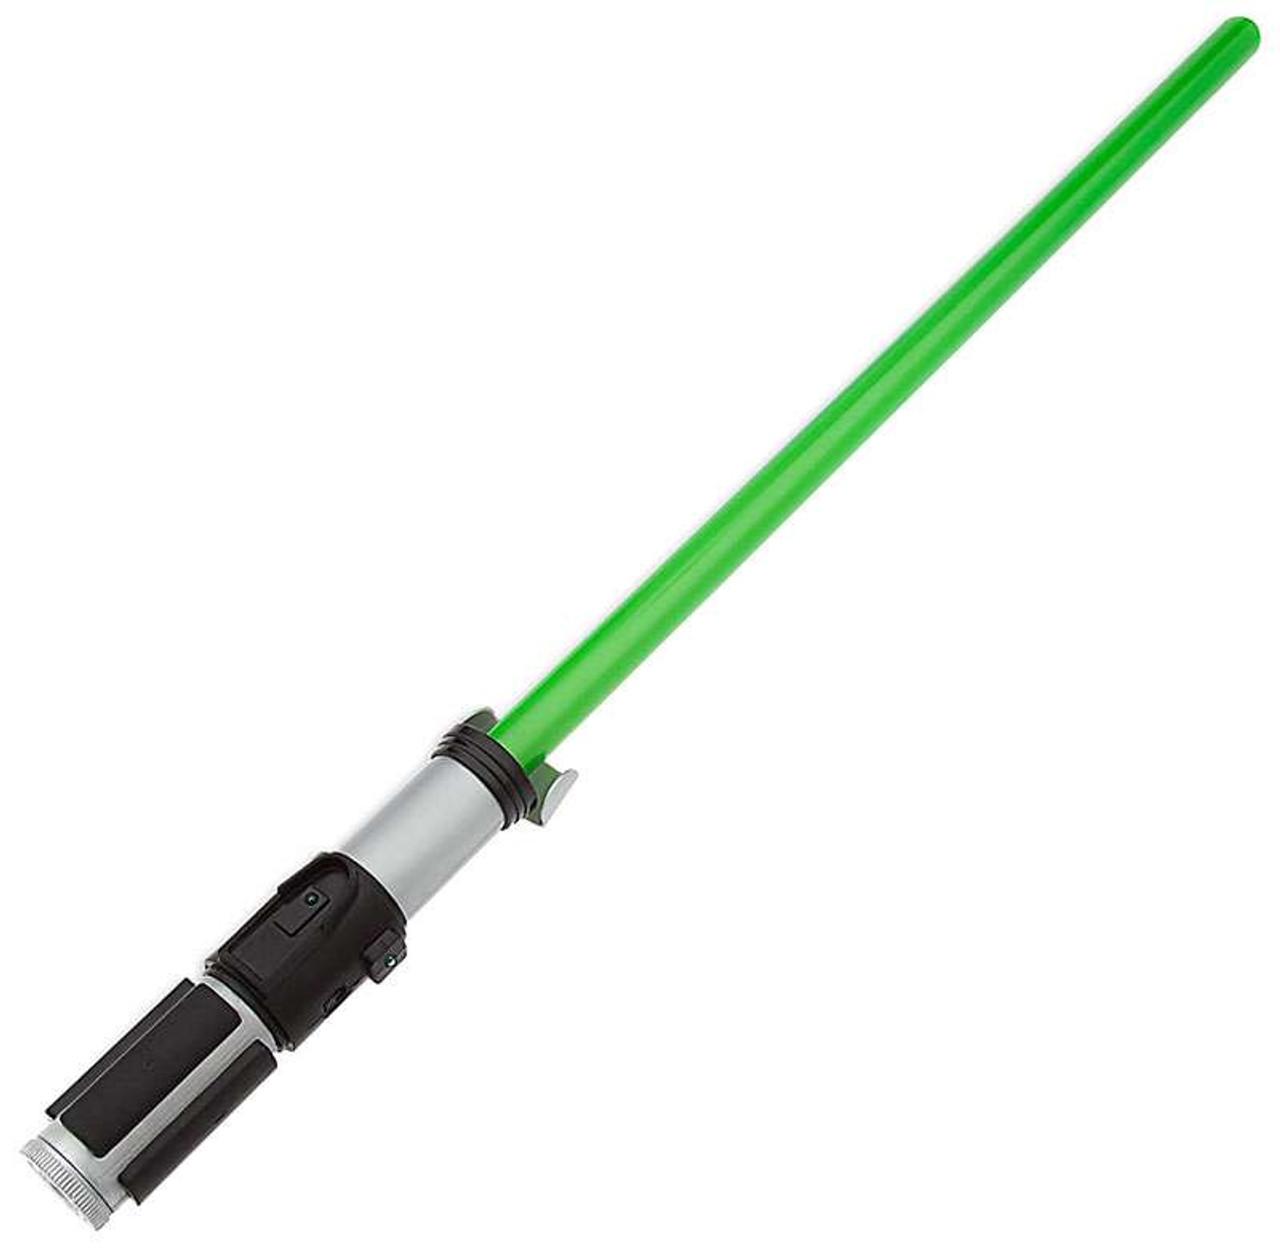 Disney Star Wars Yoda Exclusive Electronic Lightsaber 2016